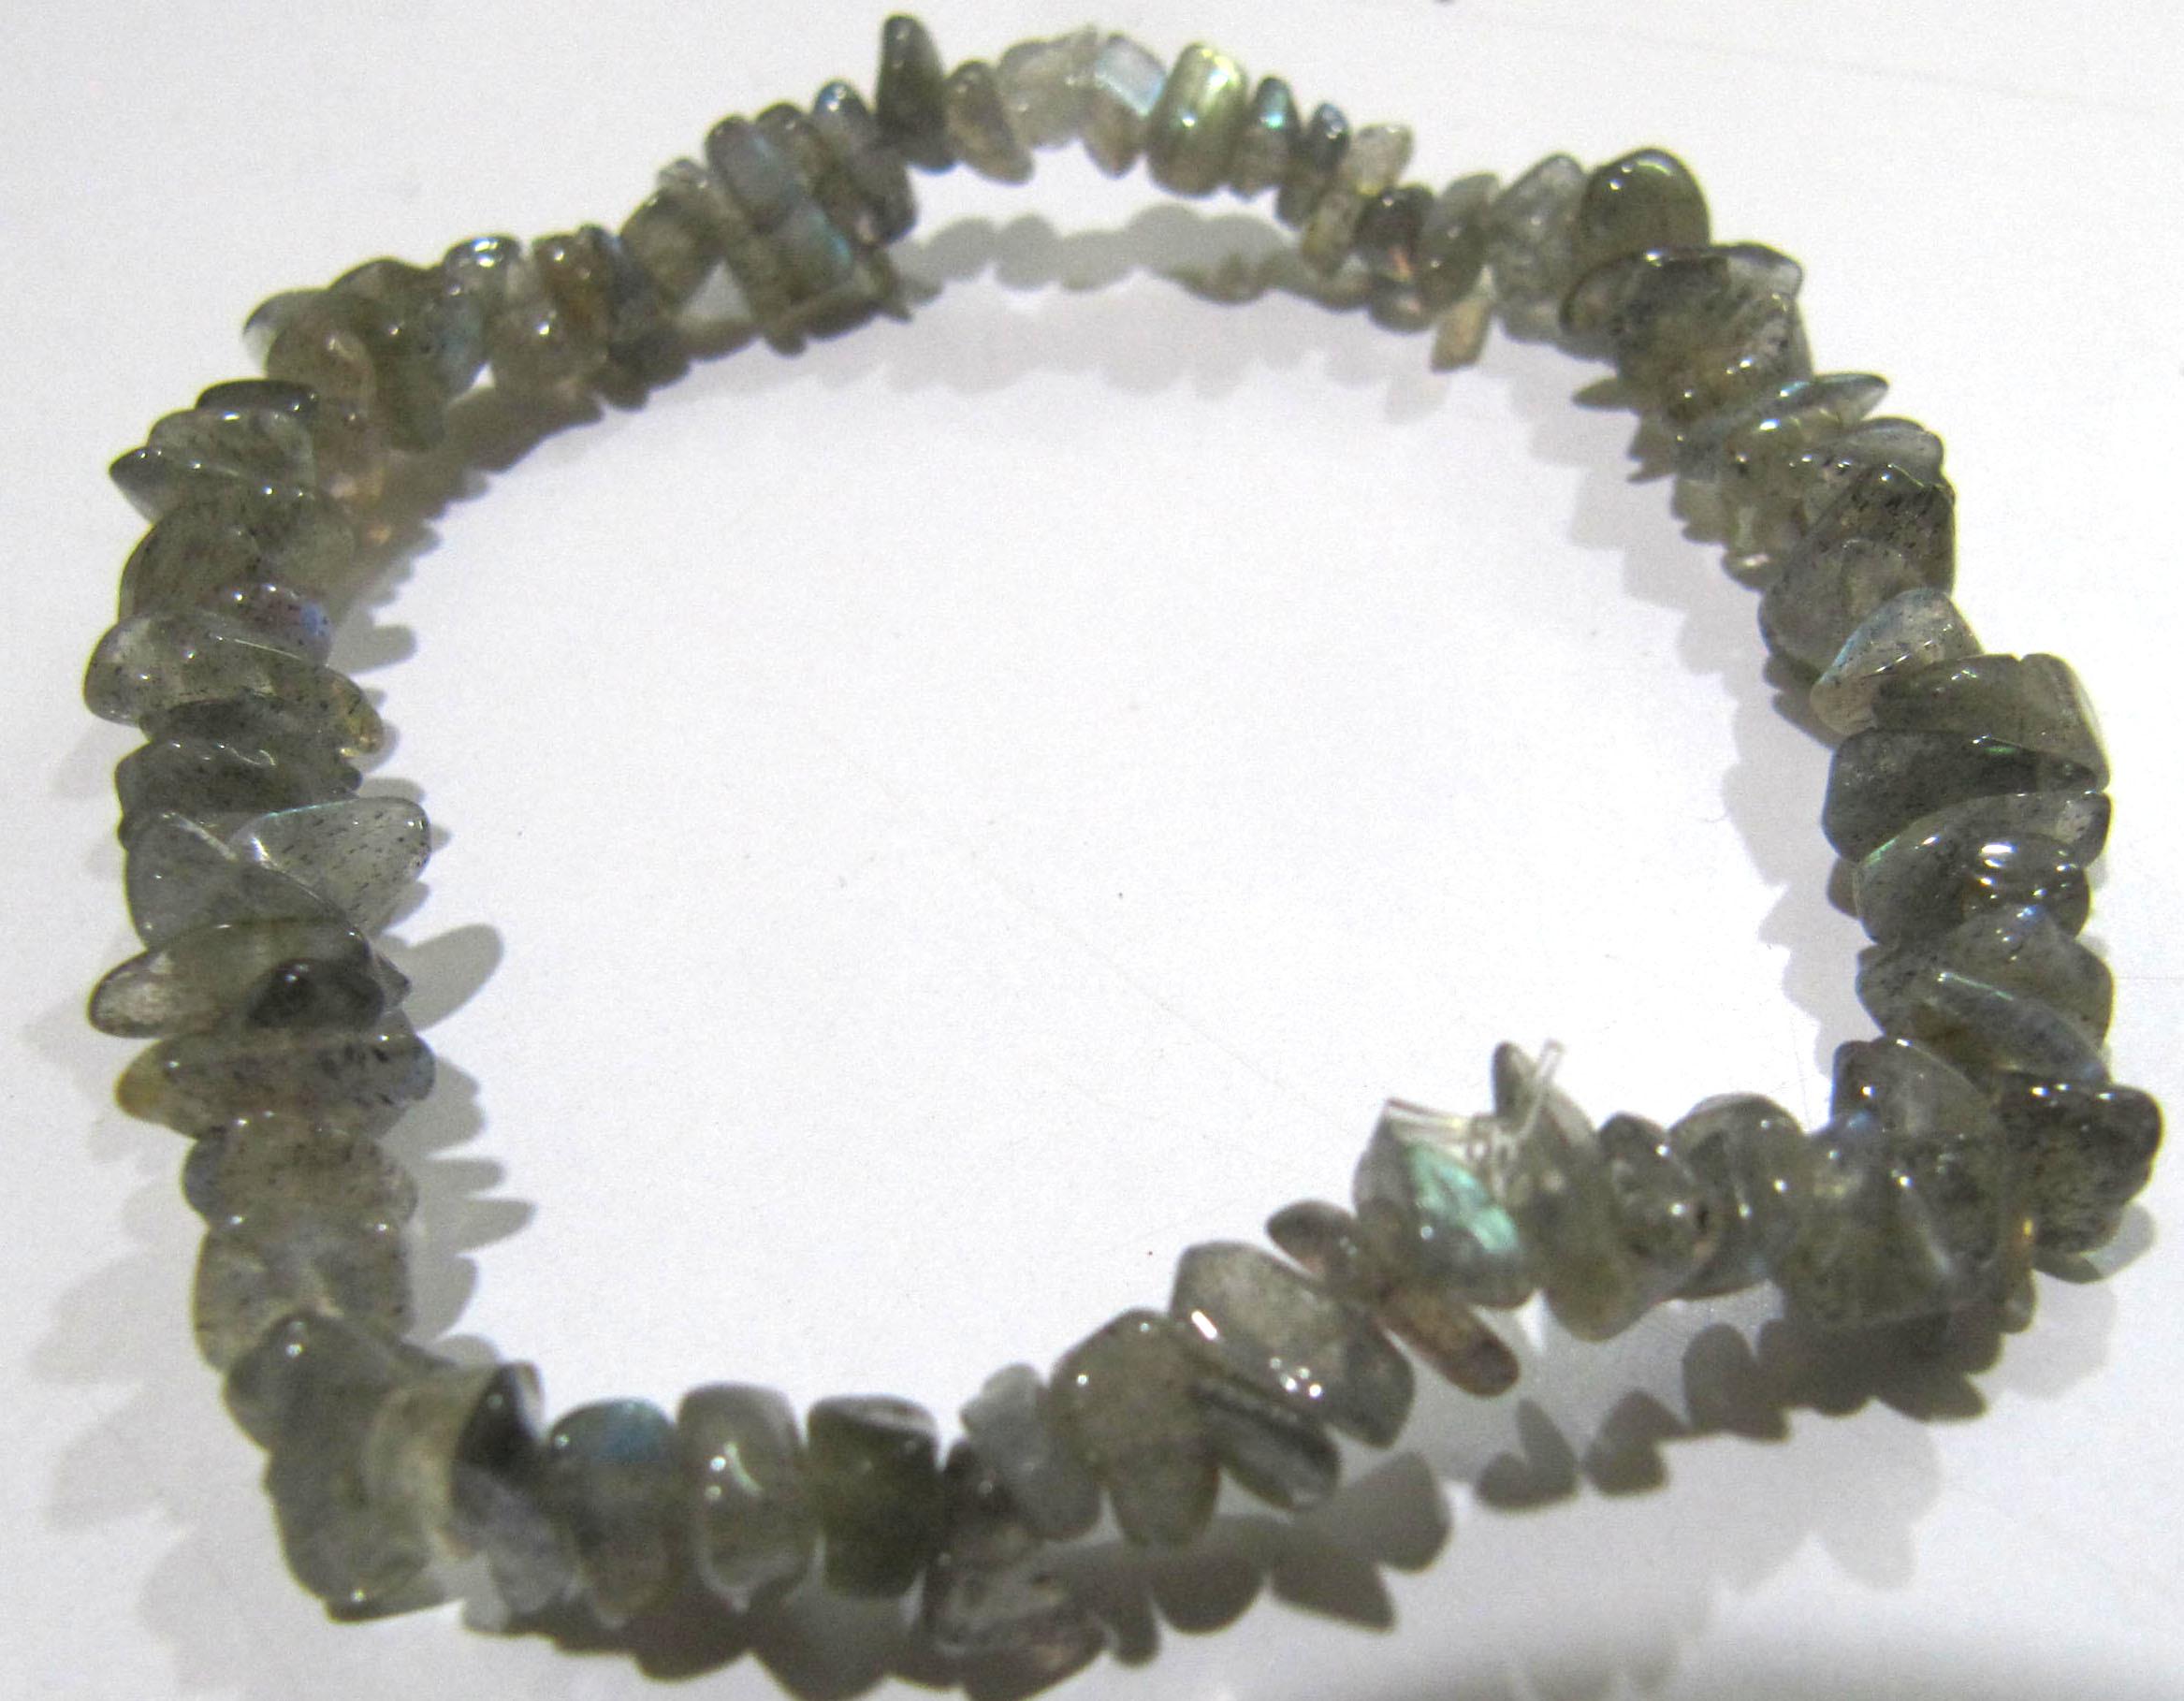 Natural Labradorite Chip Bracelet Gravel Uncut Nugget 6mm To 9mm Beads